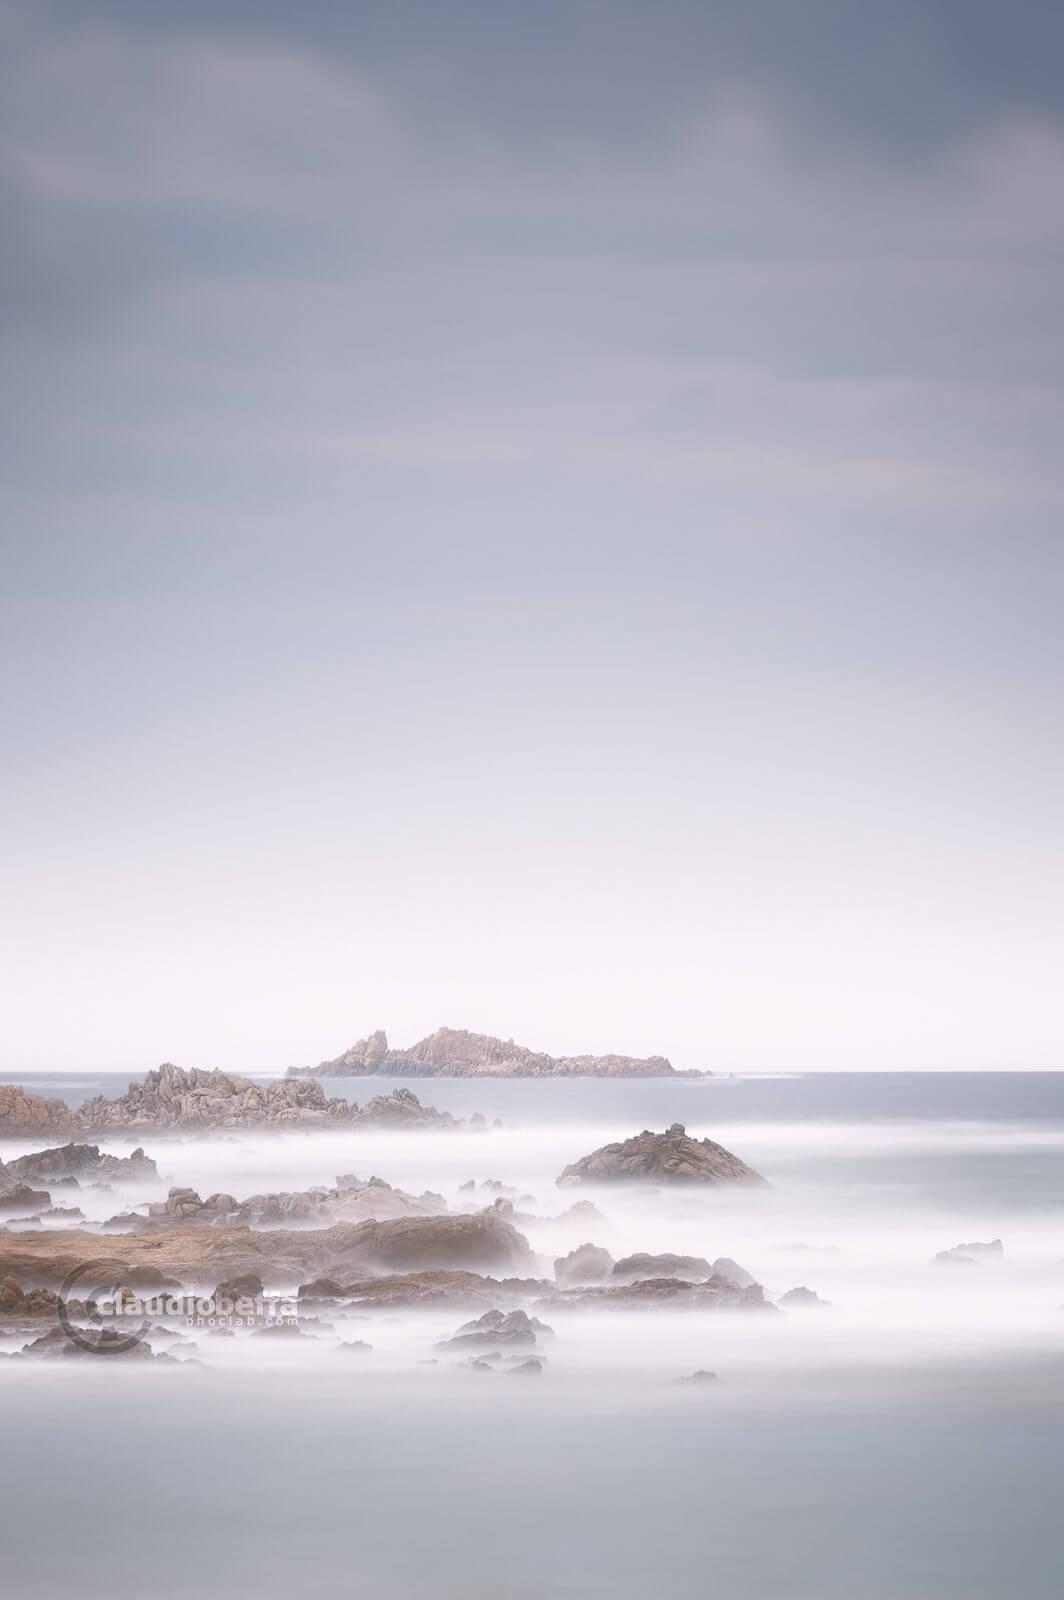 Immutability, seascape, cliff, rocks, islet, waves, sea, sky, wind, sardinia, italy, long exposure